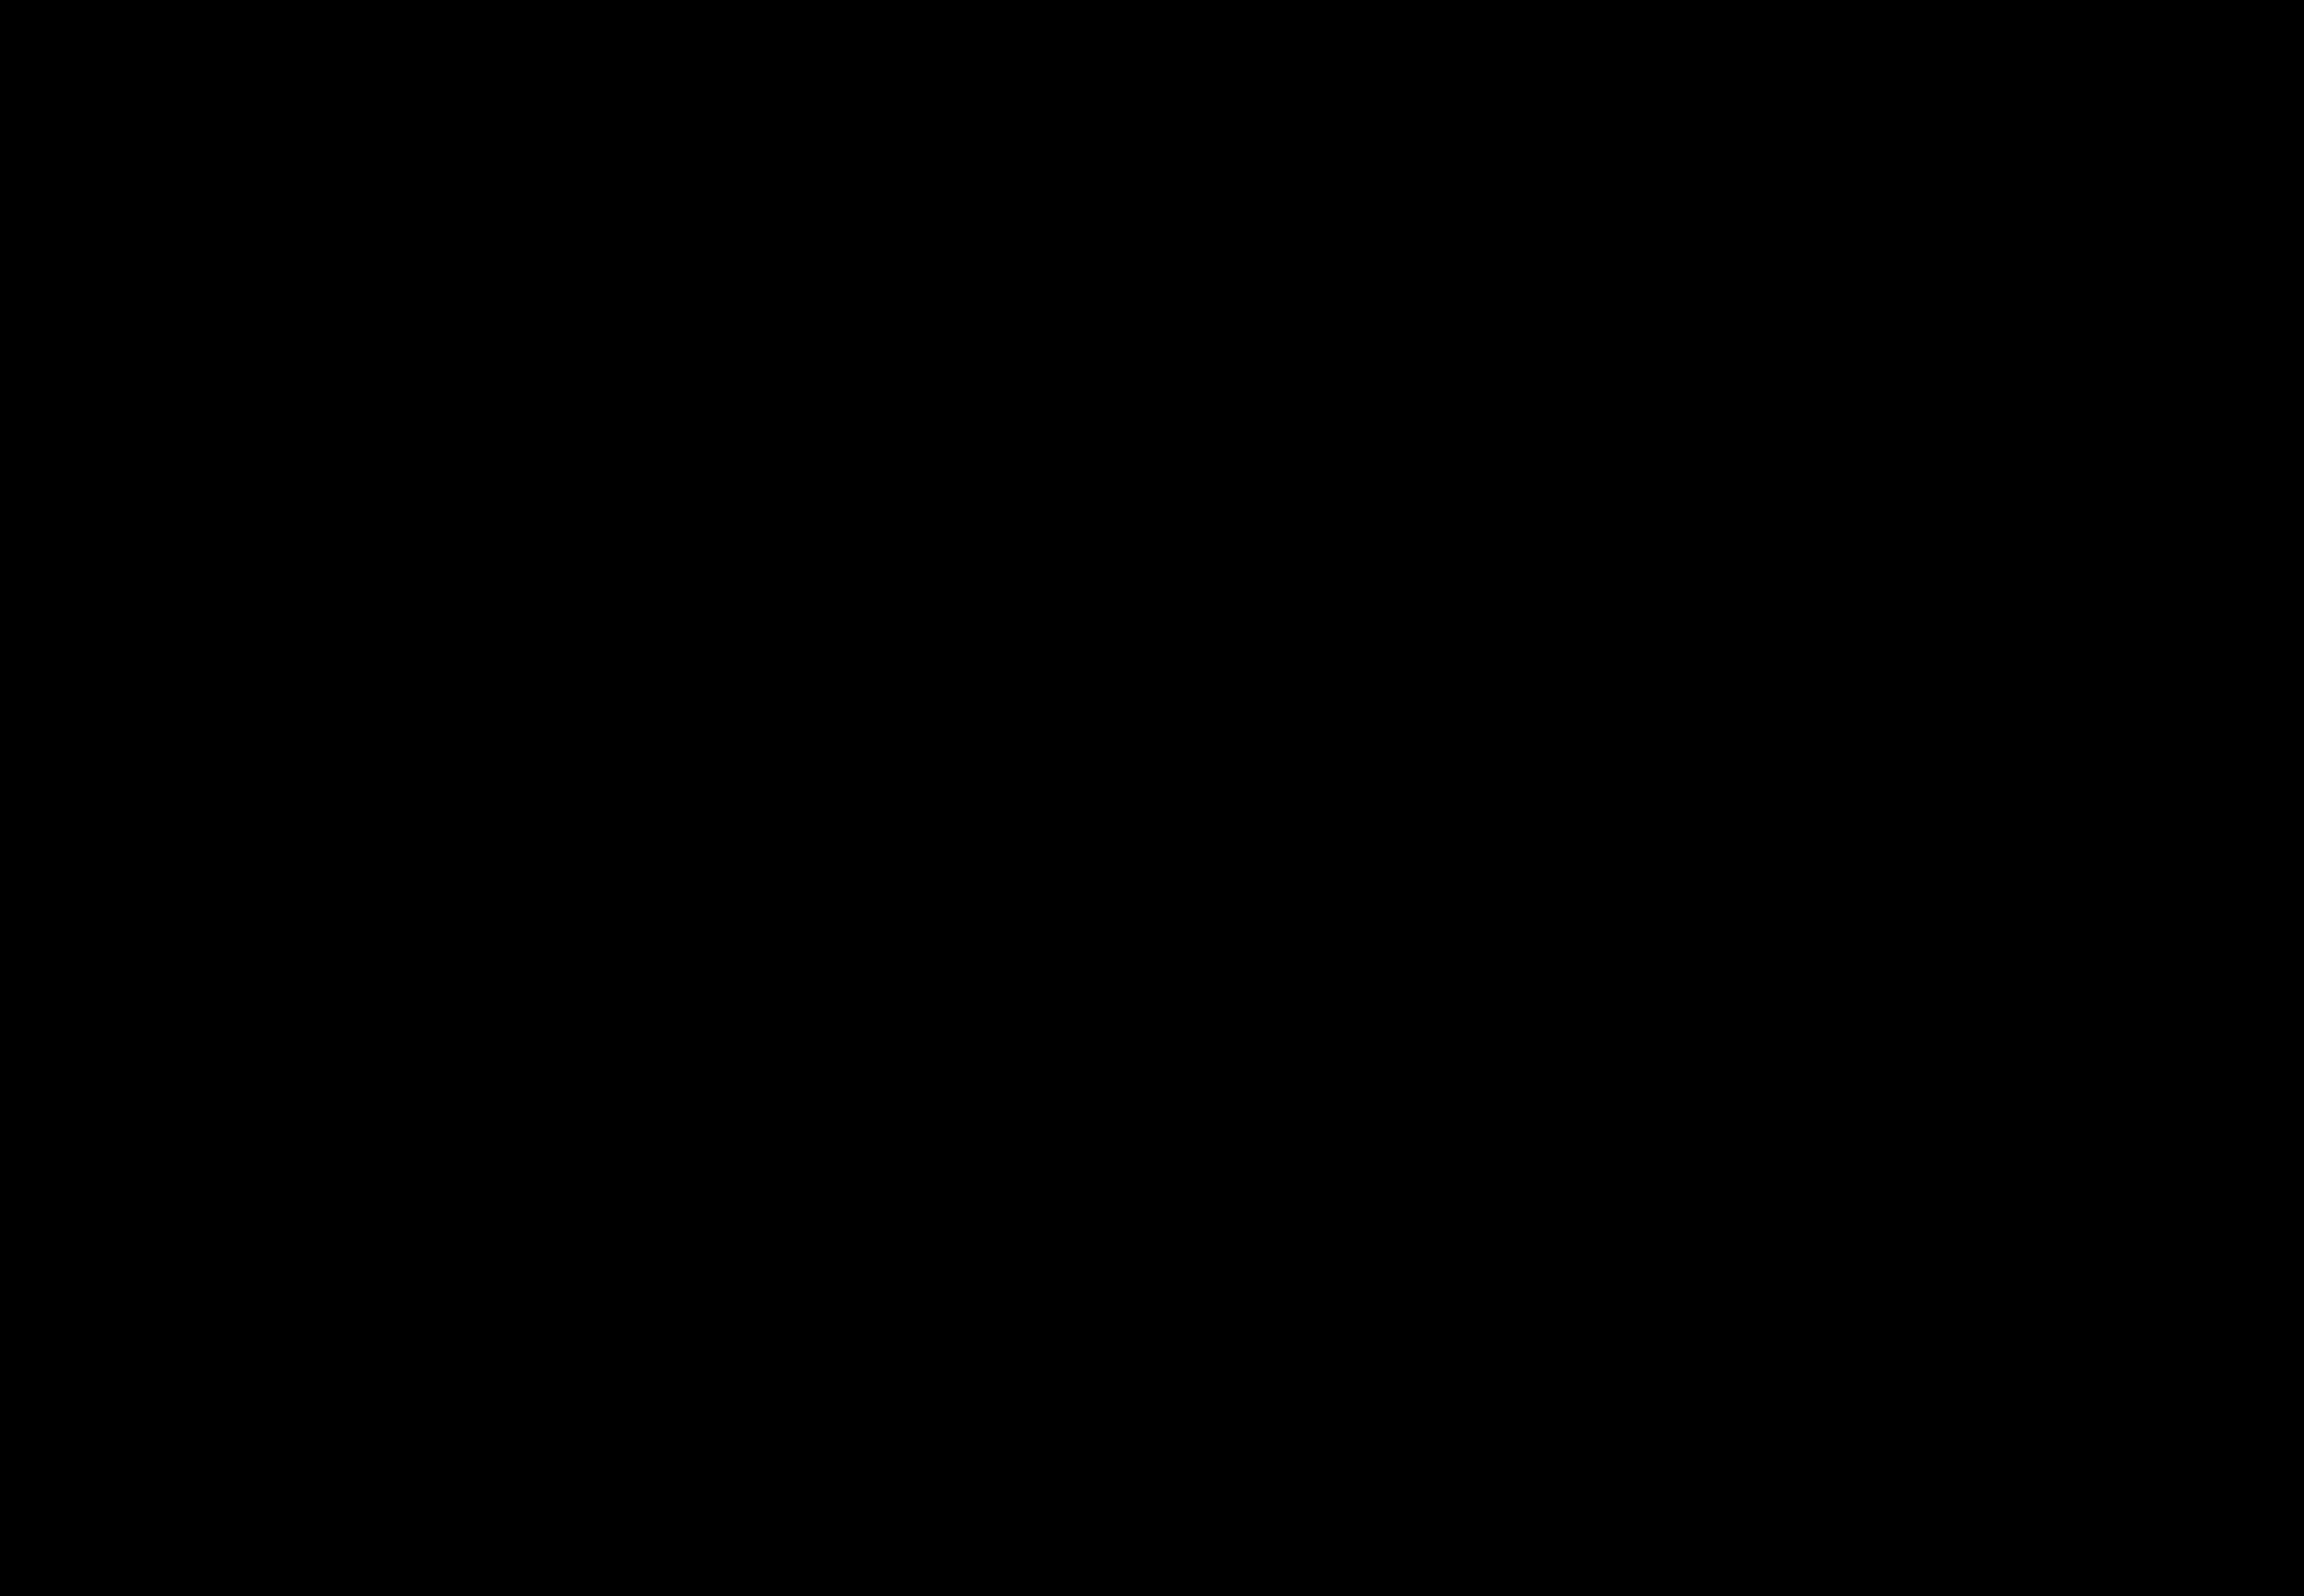 vector black and white download Cells clipart line art. Happy spermatozoide big image.